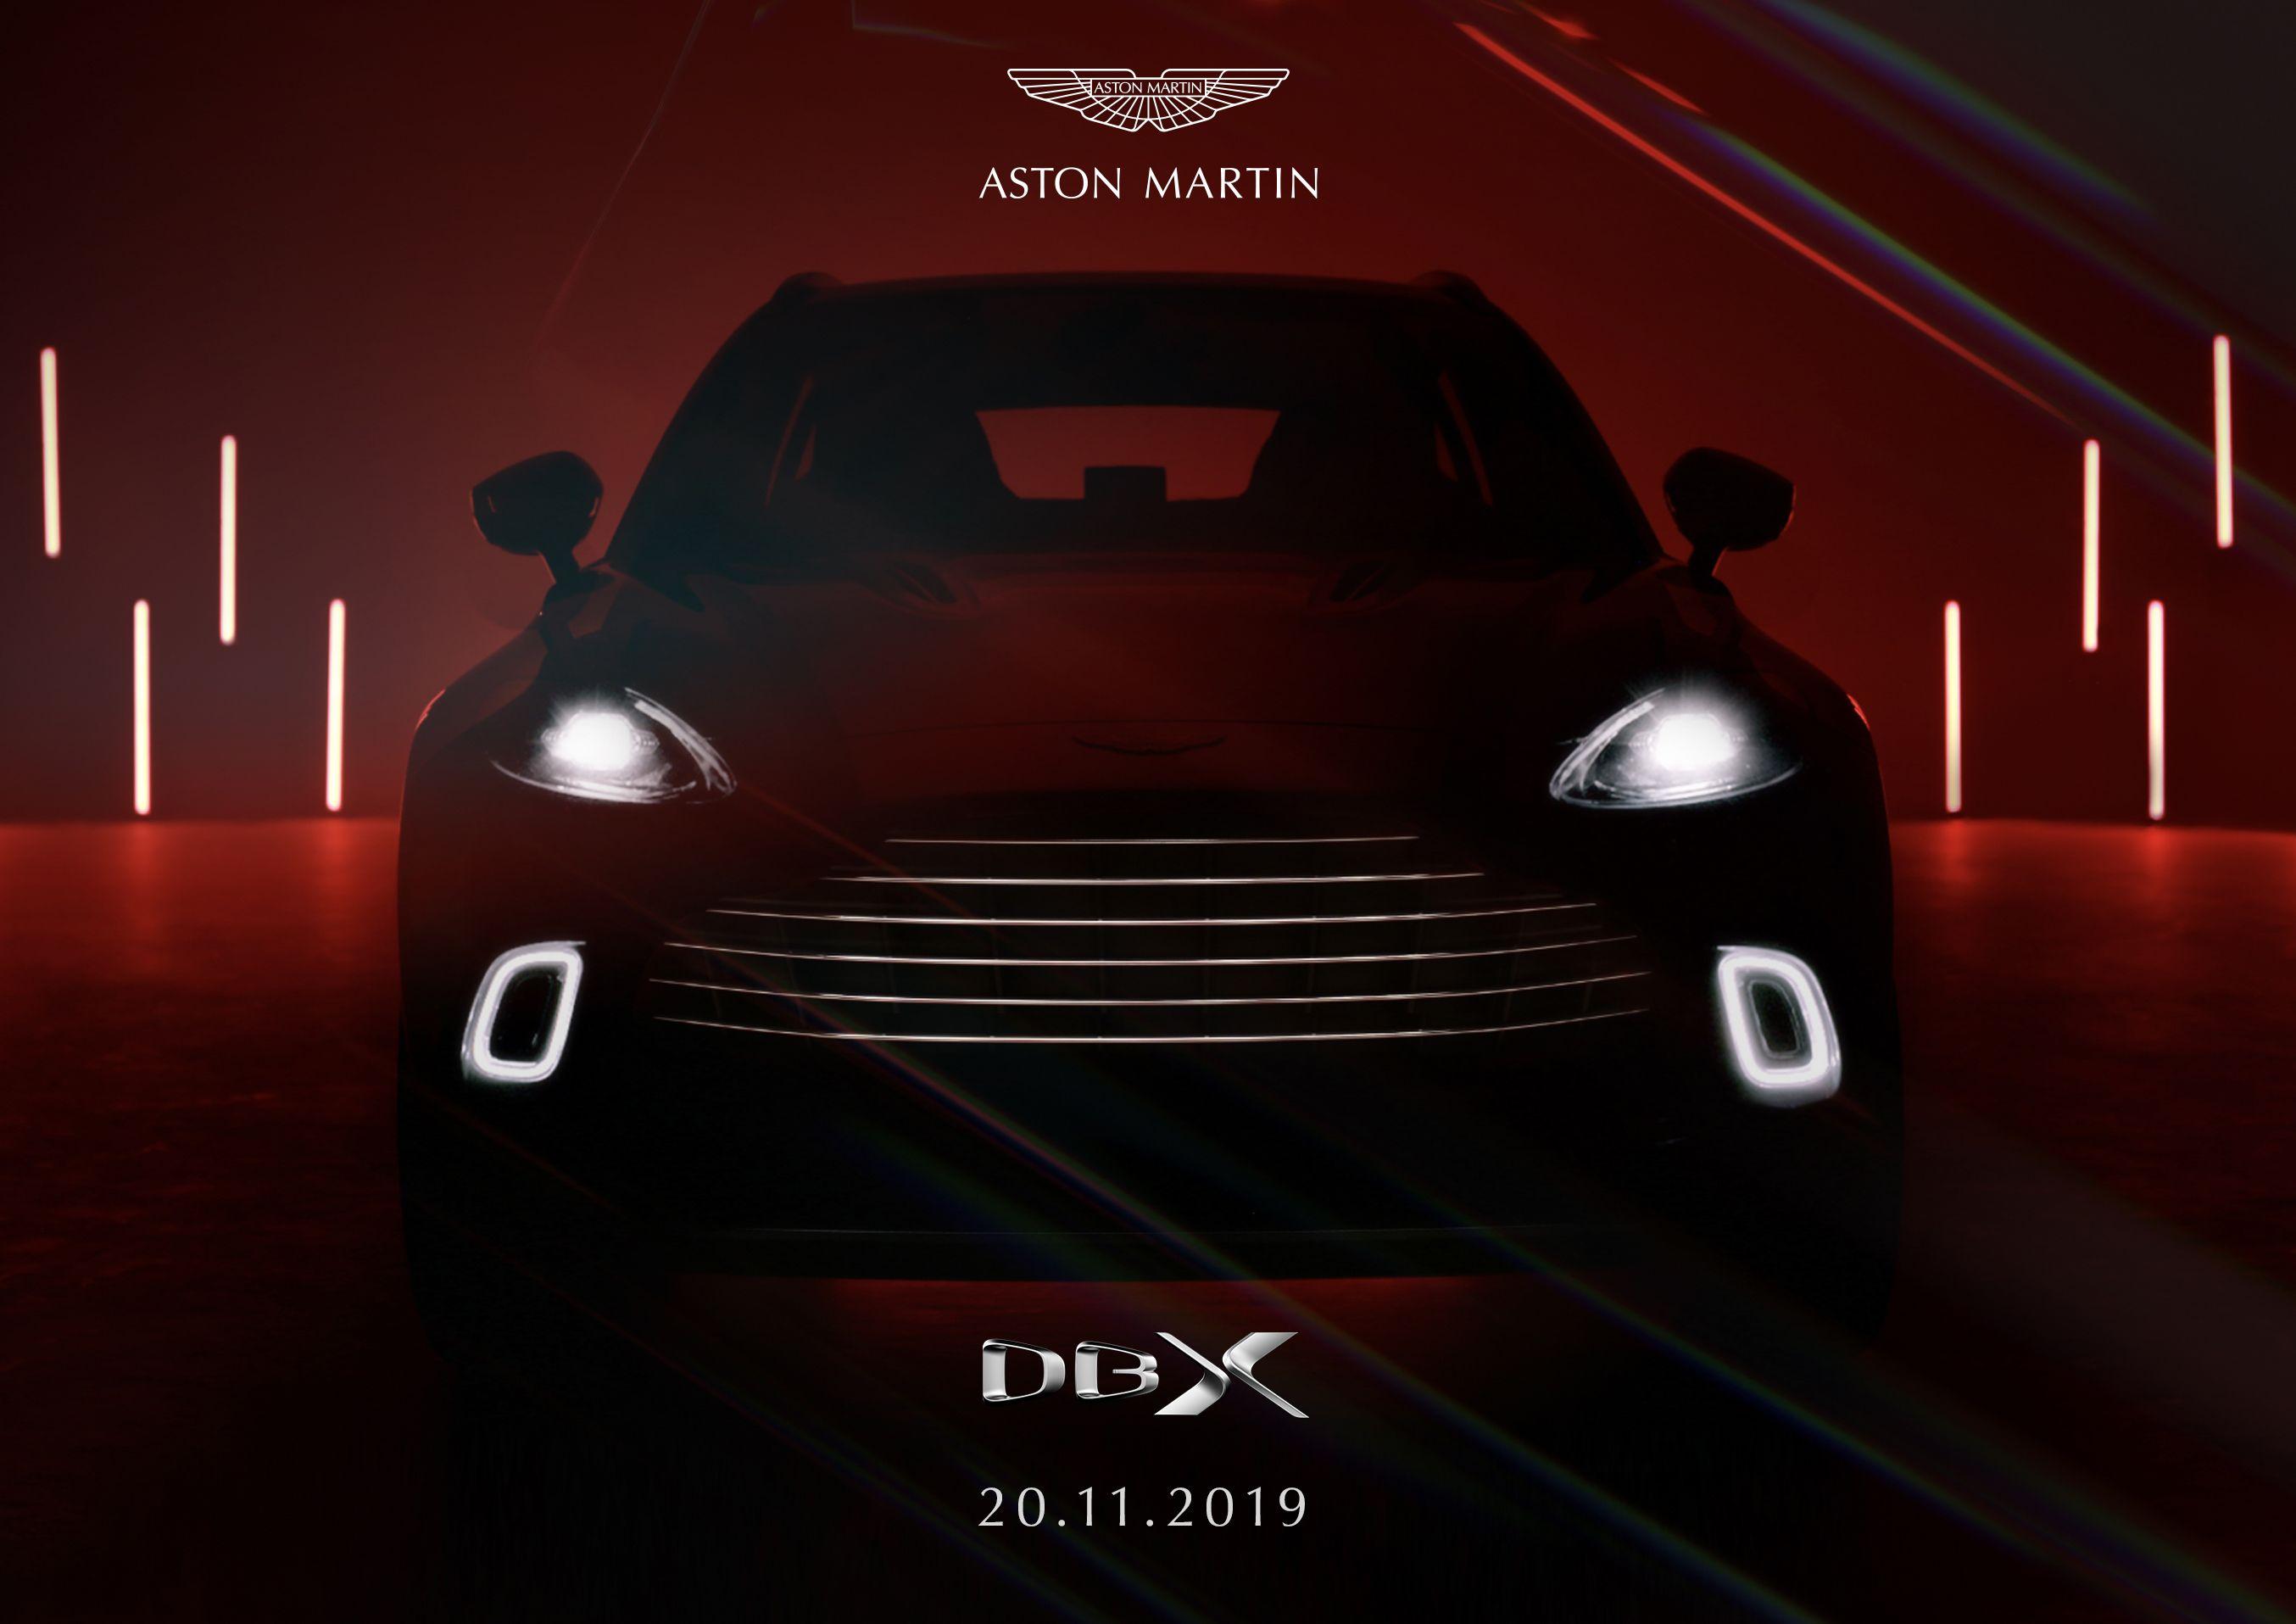 Aston Martin Reveals The Dbx Suv S Interior And Price